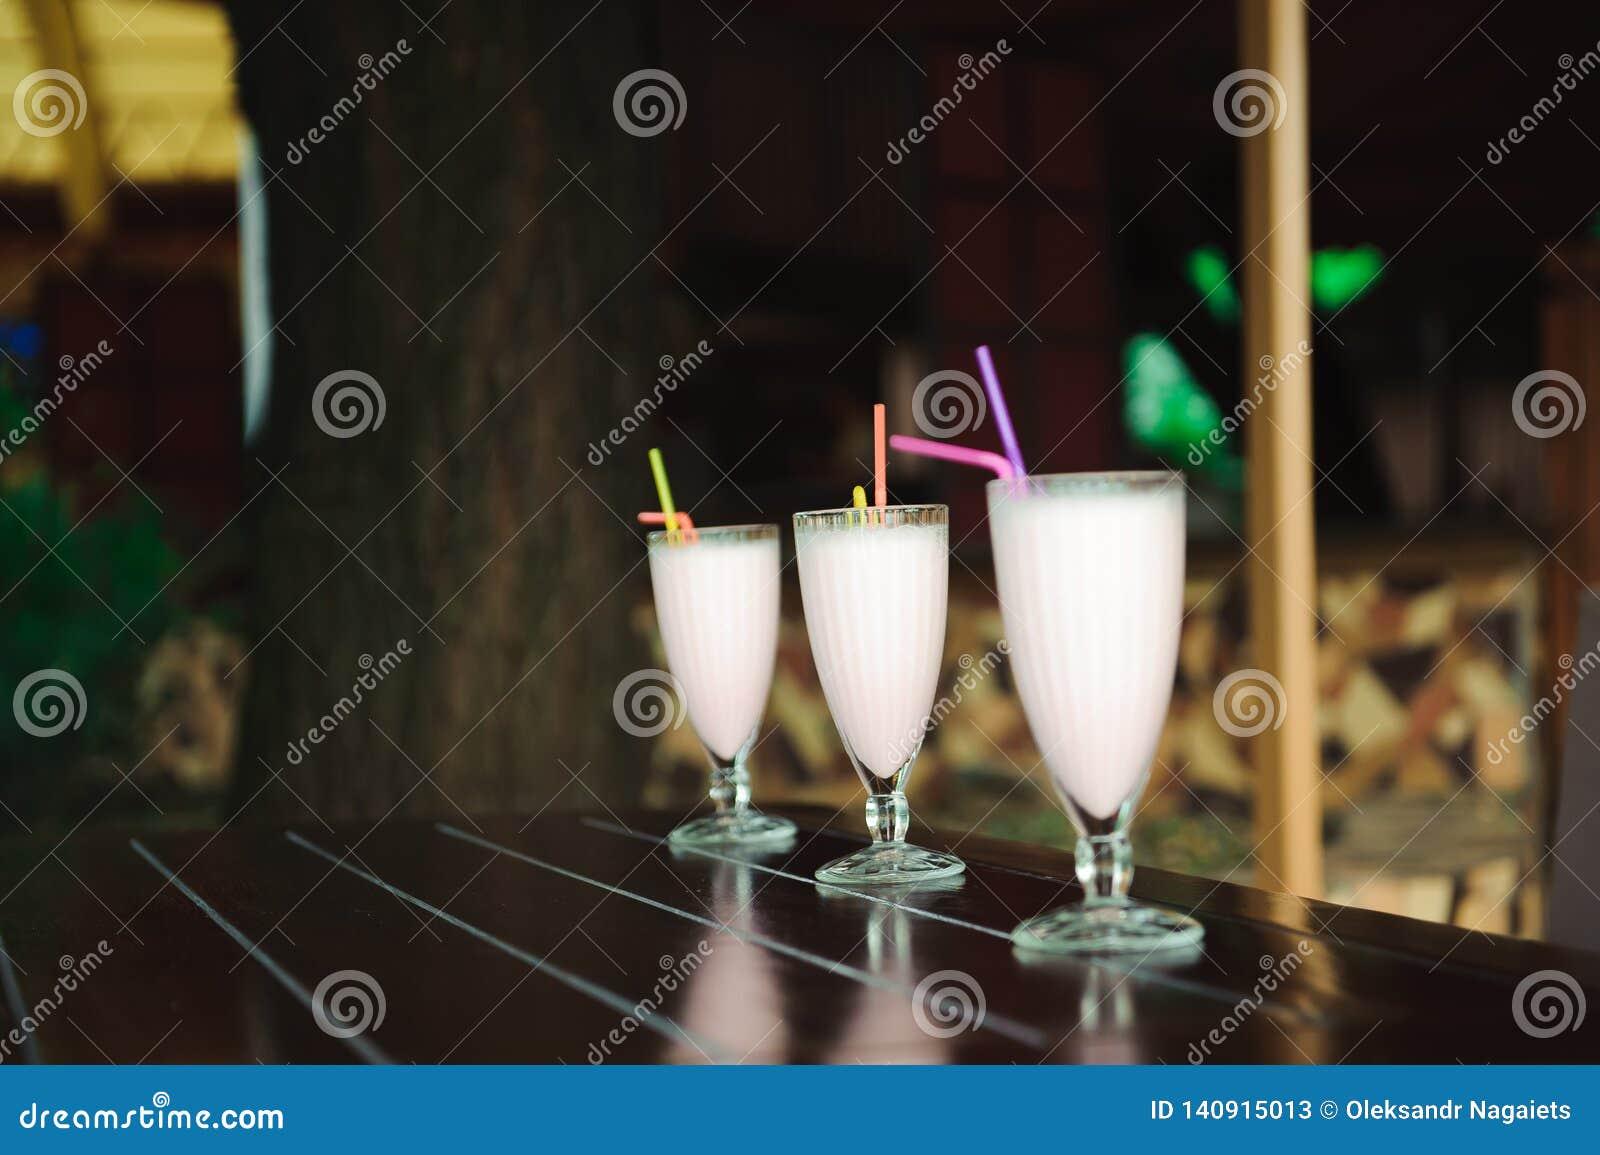 Three milkshakes and smoothies on wooden table.